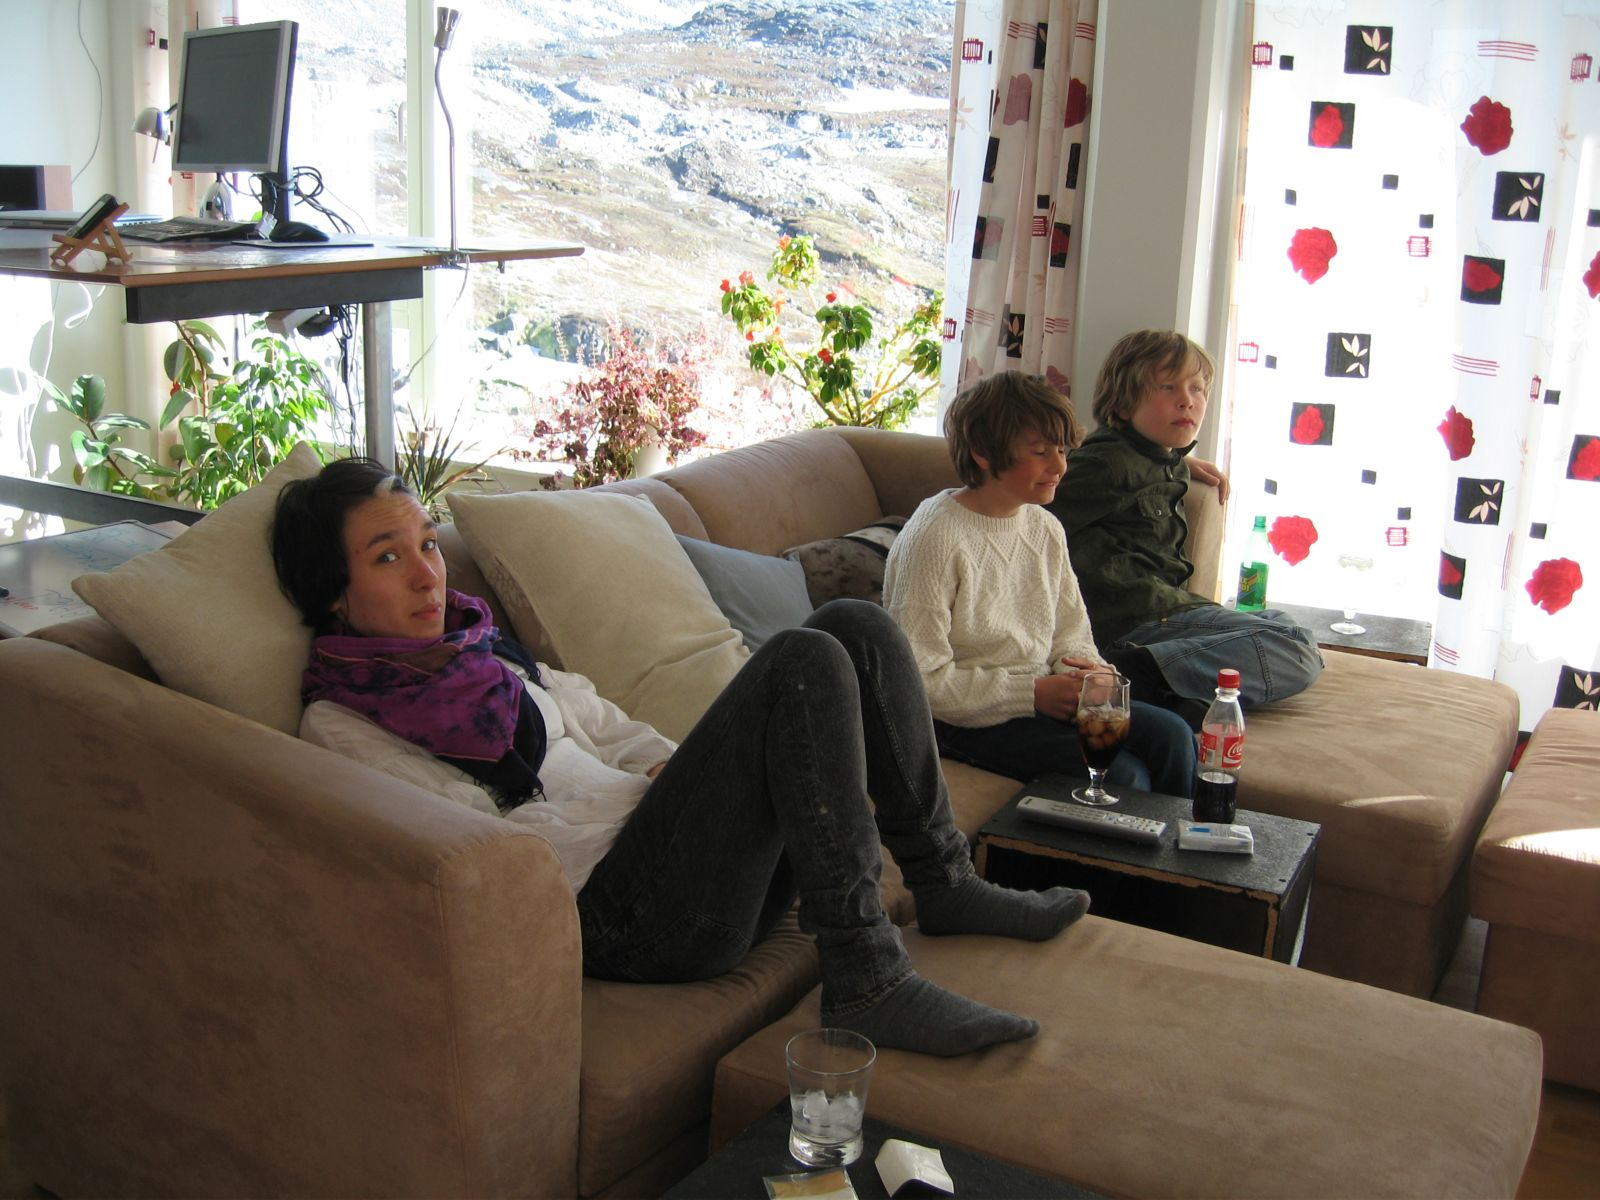 2009-06-12-1834_Ivalo Lynge Labansen; Rumle Labansen